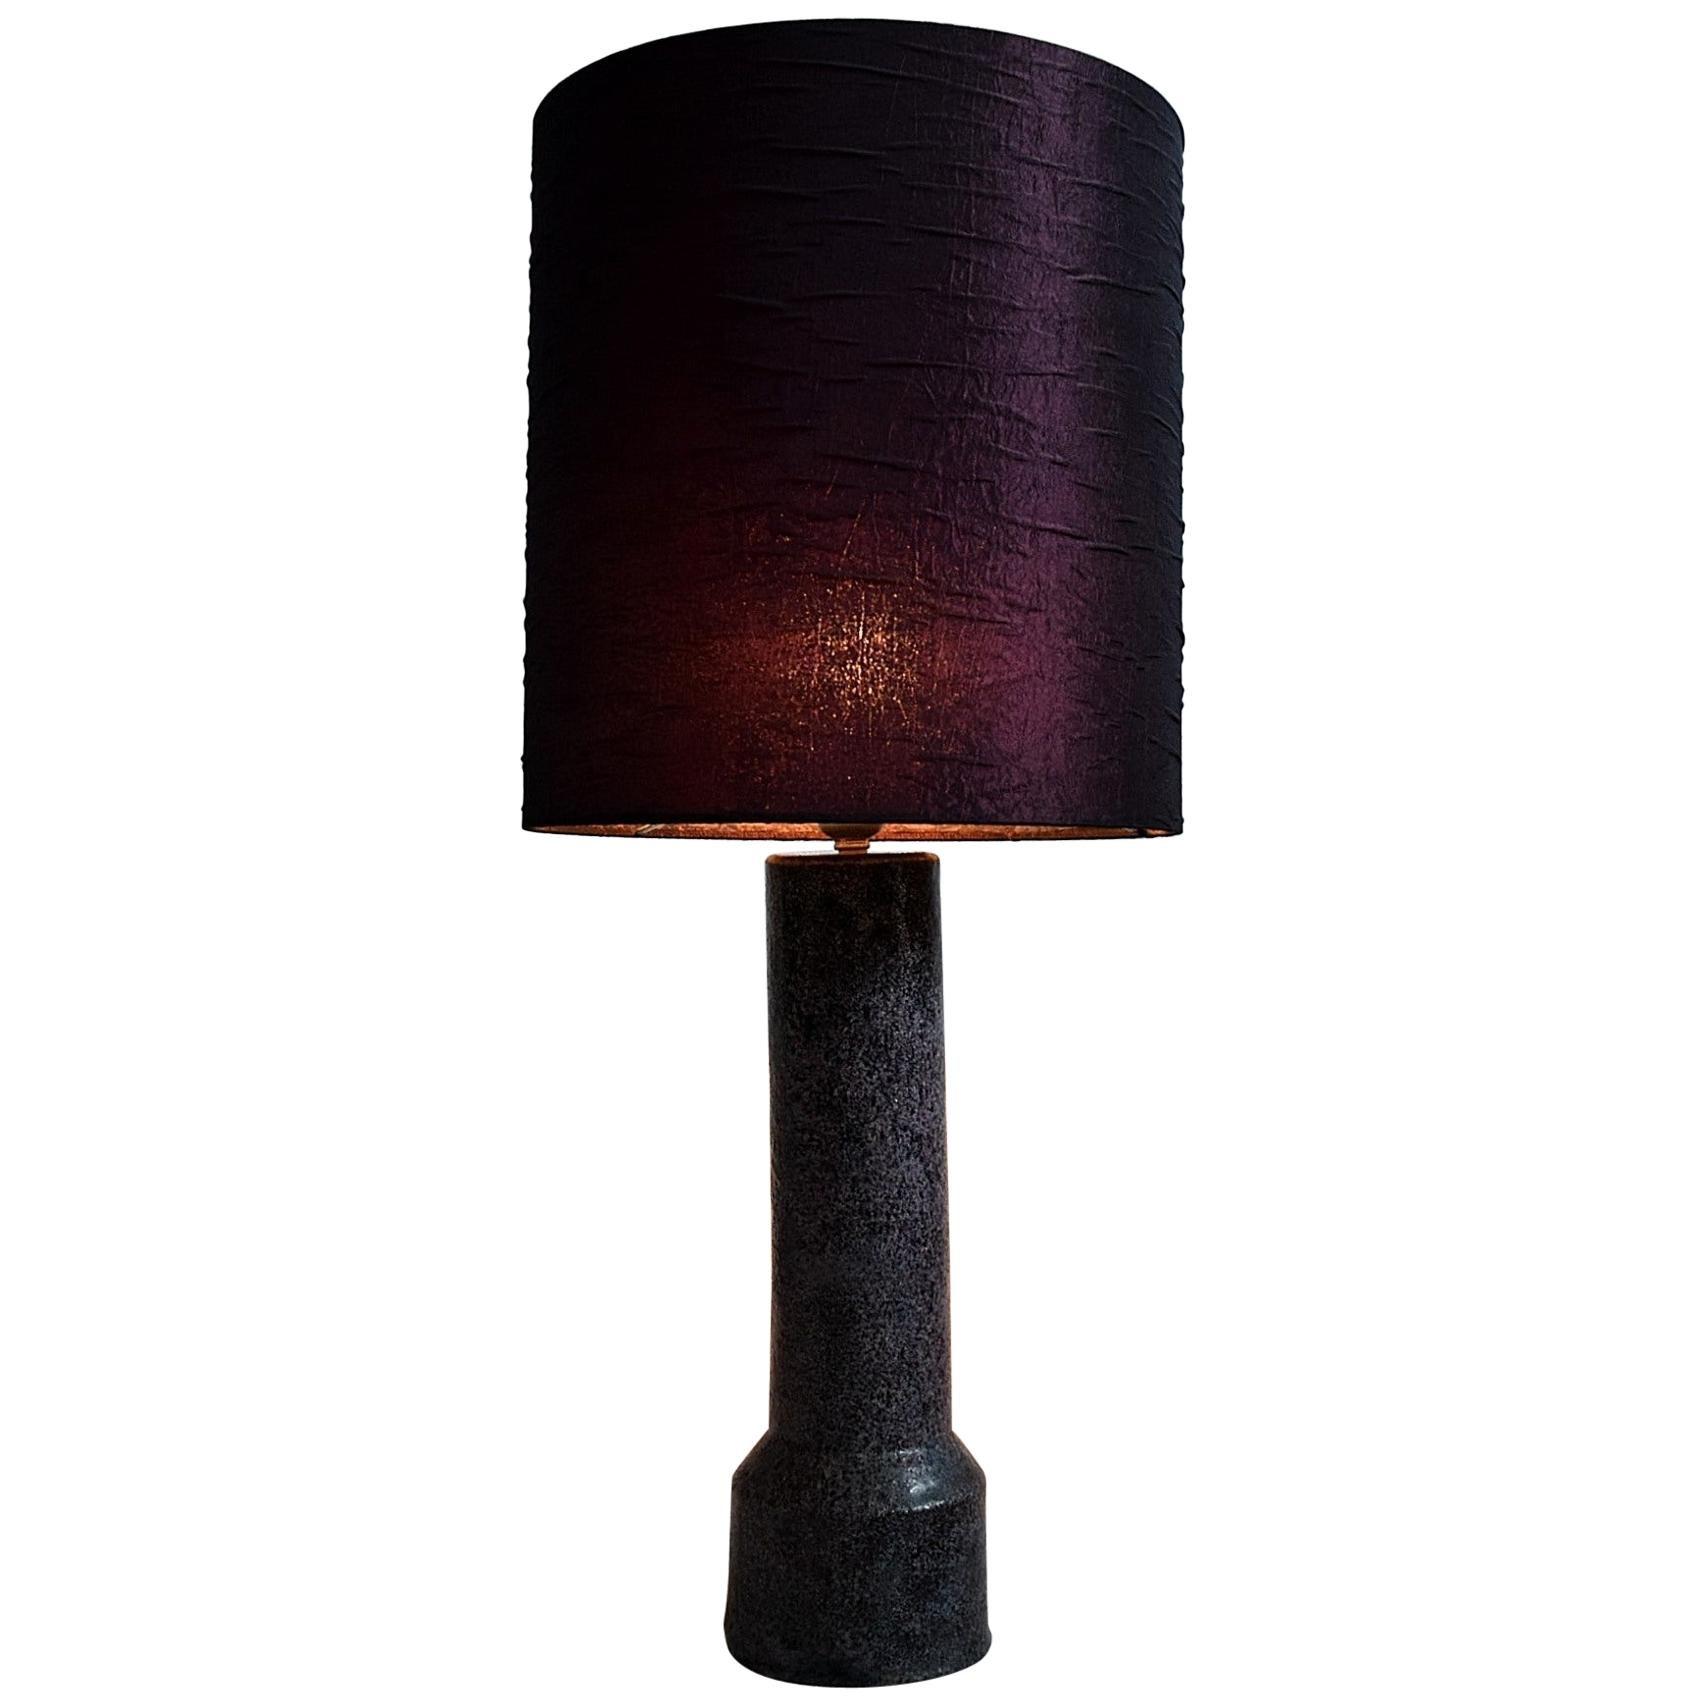 Mid-Century Modern Purple Ceramic Table Lamp by Pieter Groeneveldt